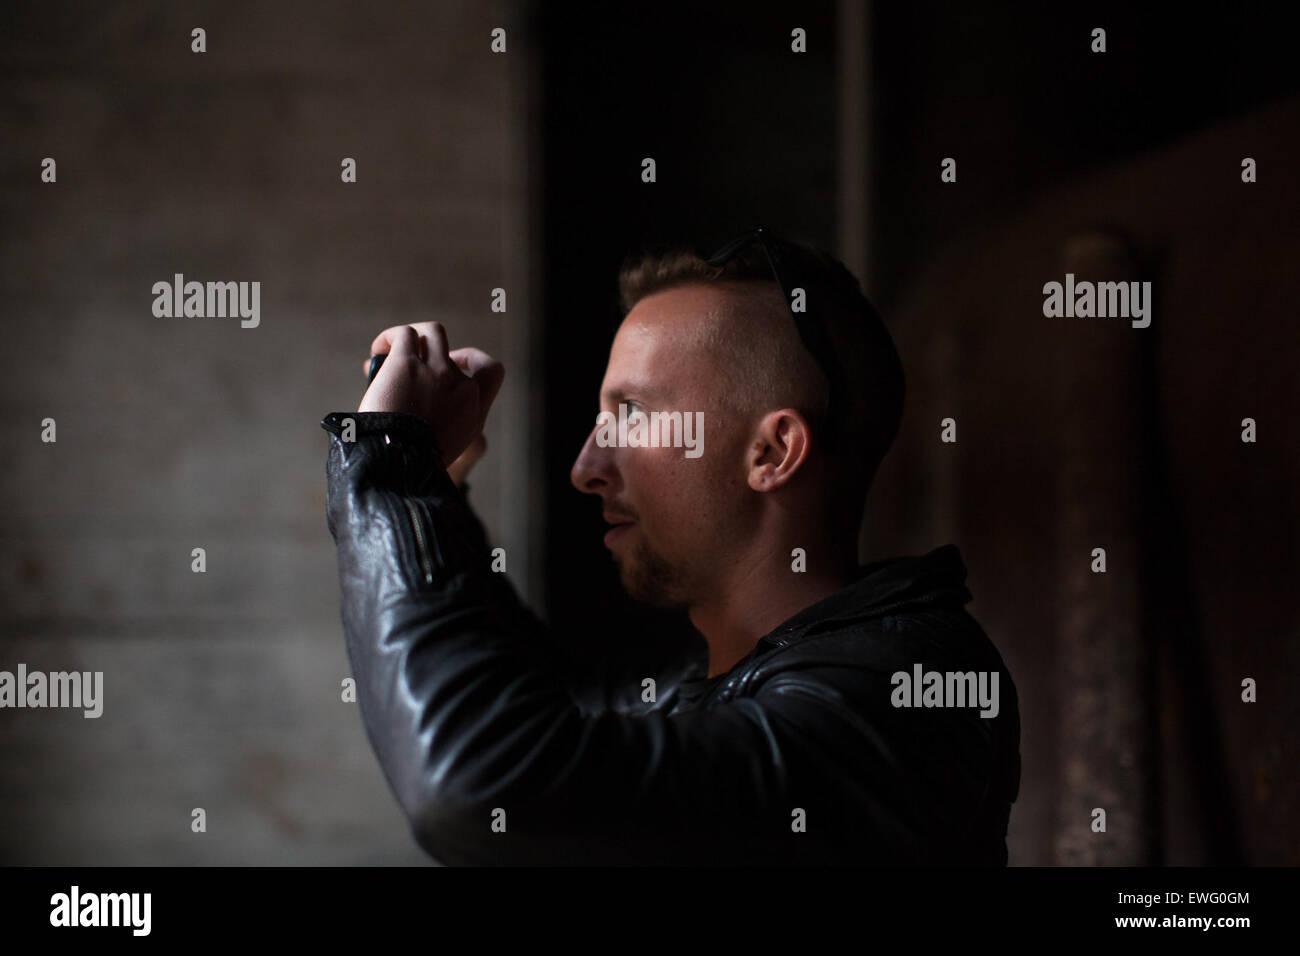 Man in Black Jacket Holding Camera - Stock Image